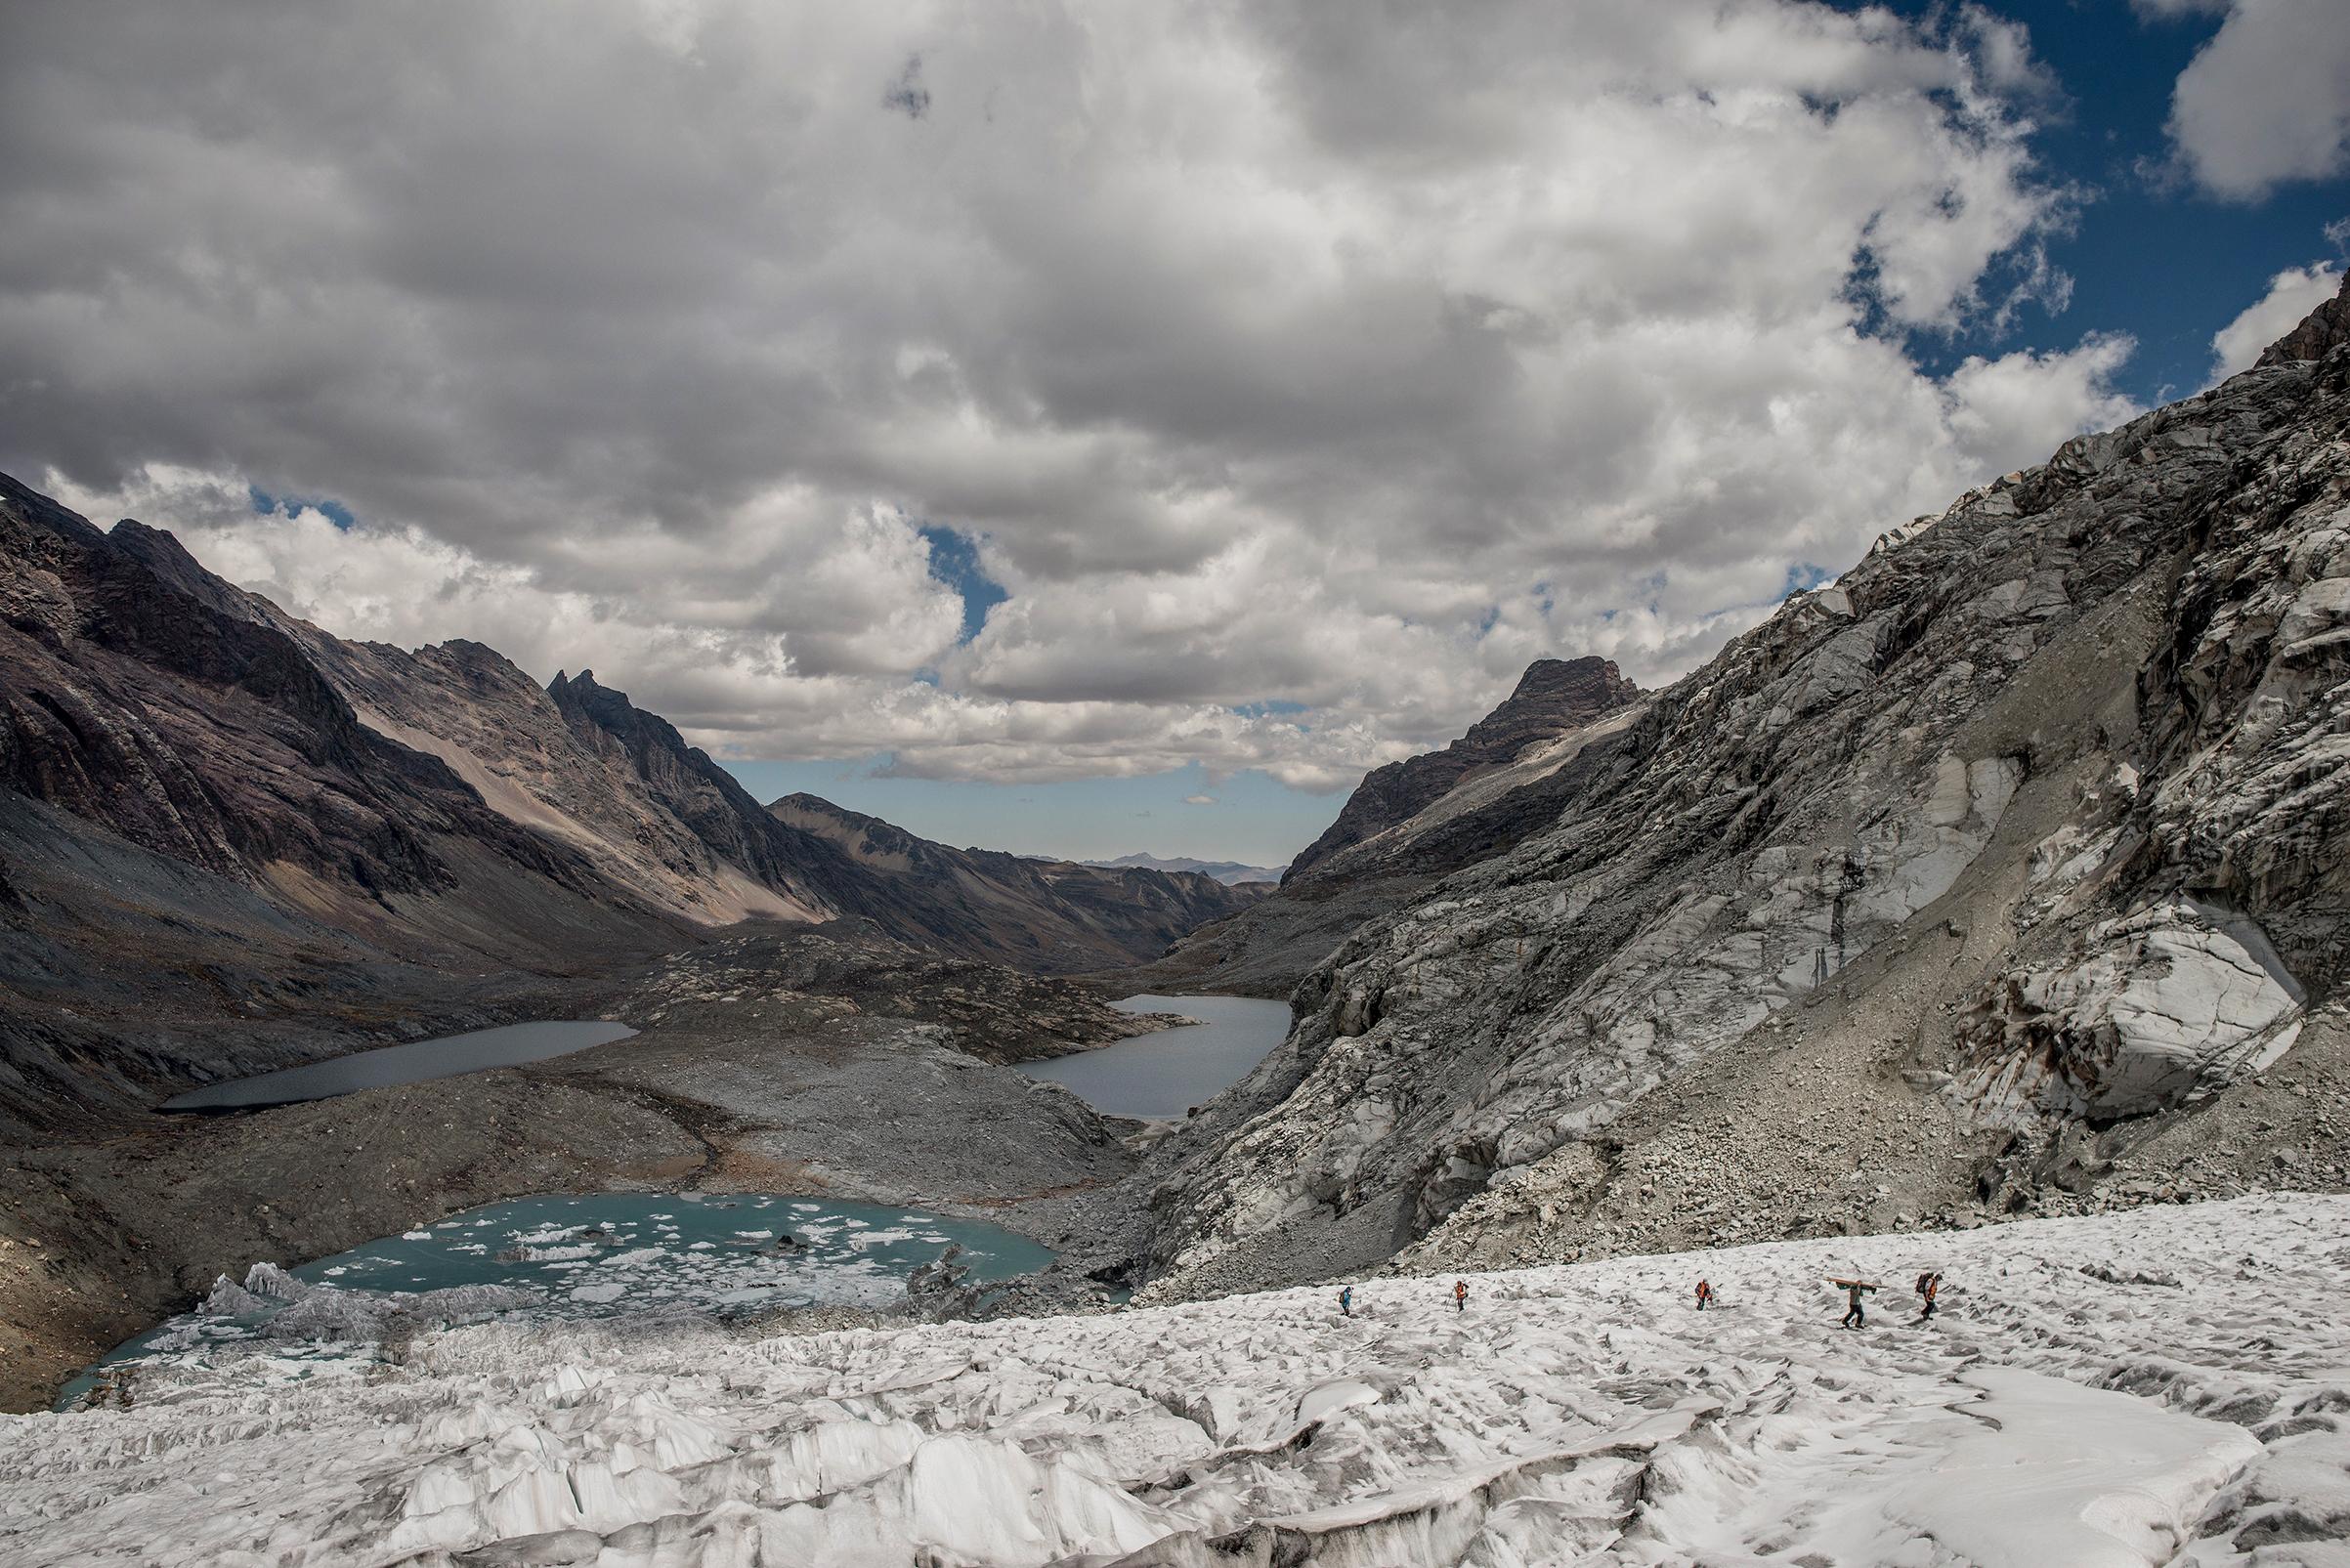 Researchers work on the Gueshgue glacier in the Cordillera Blanca region in August 2017.